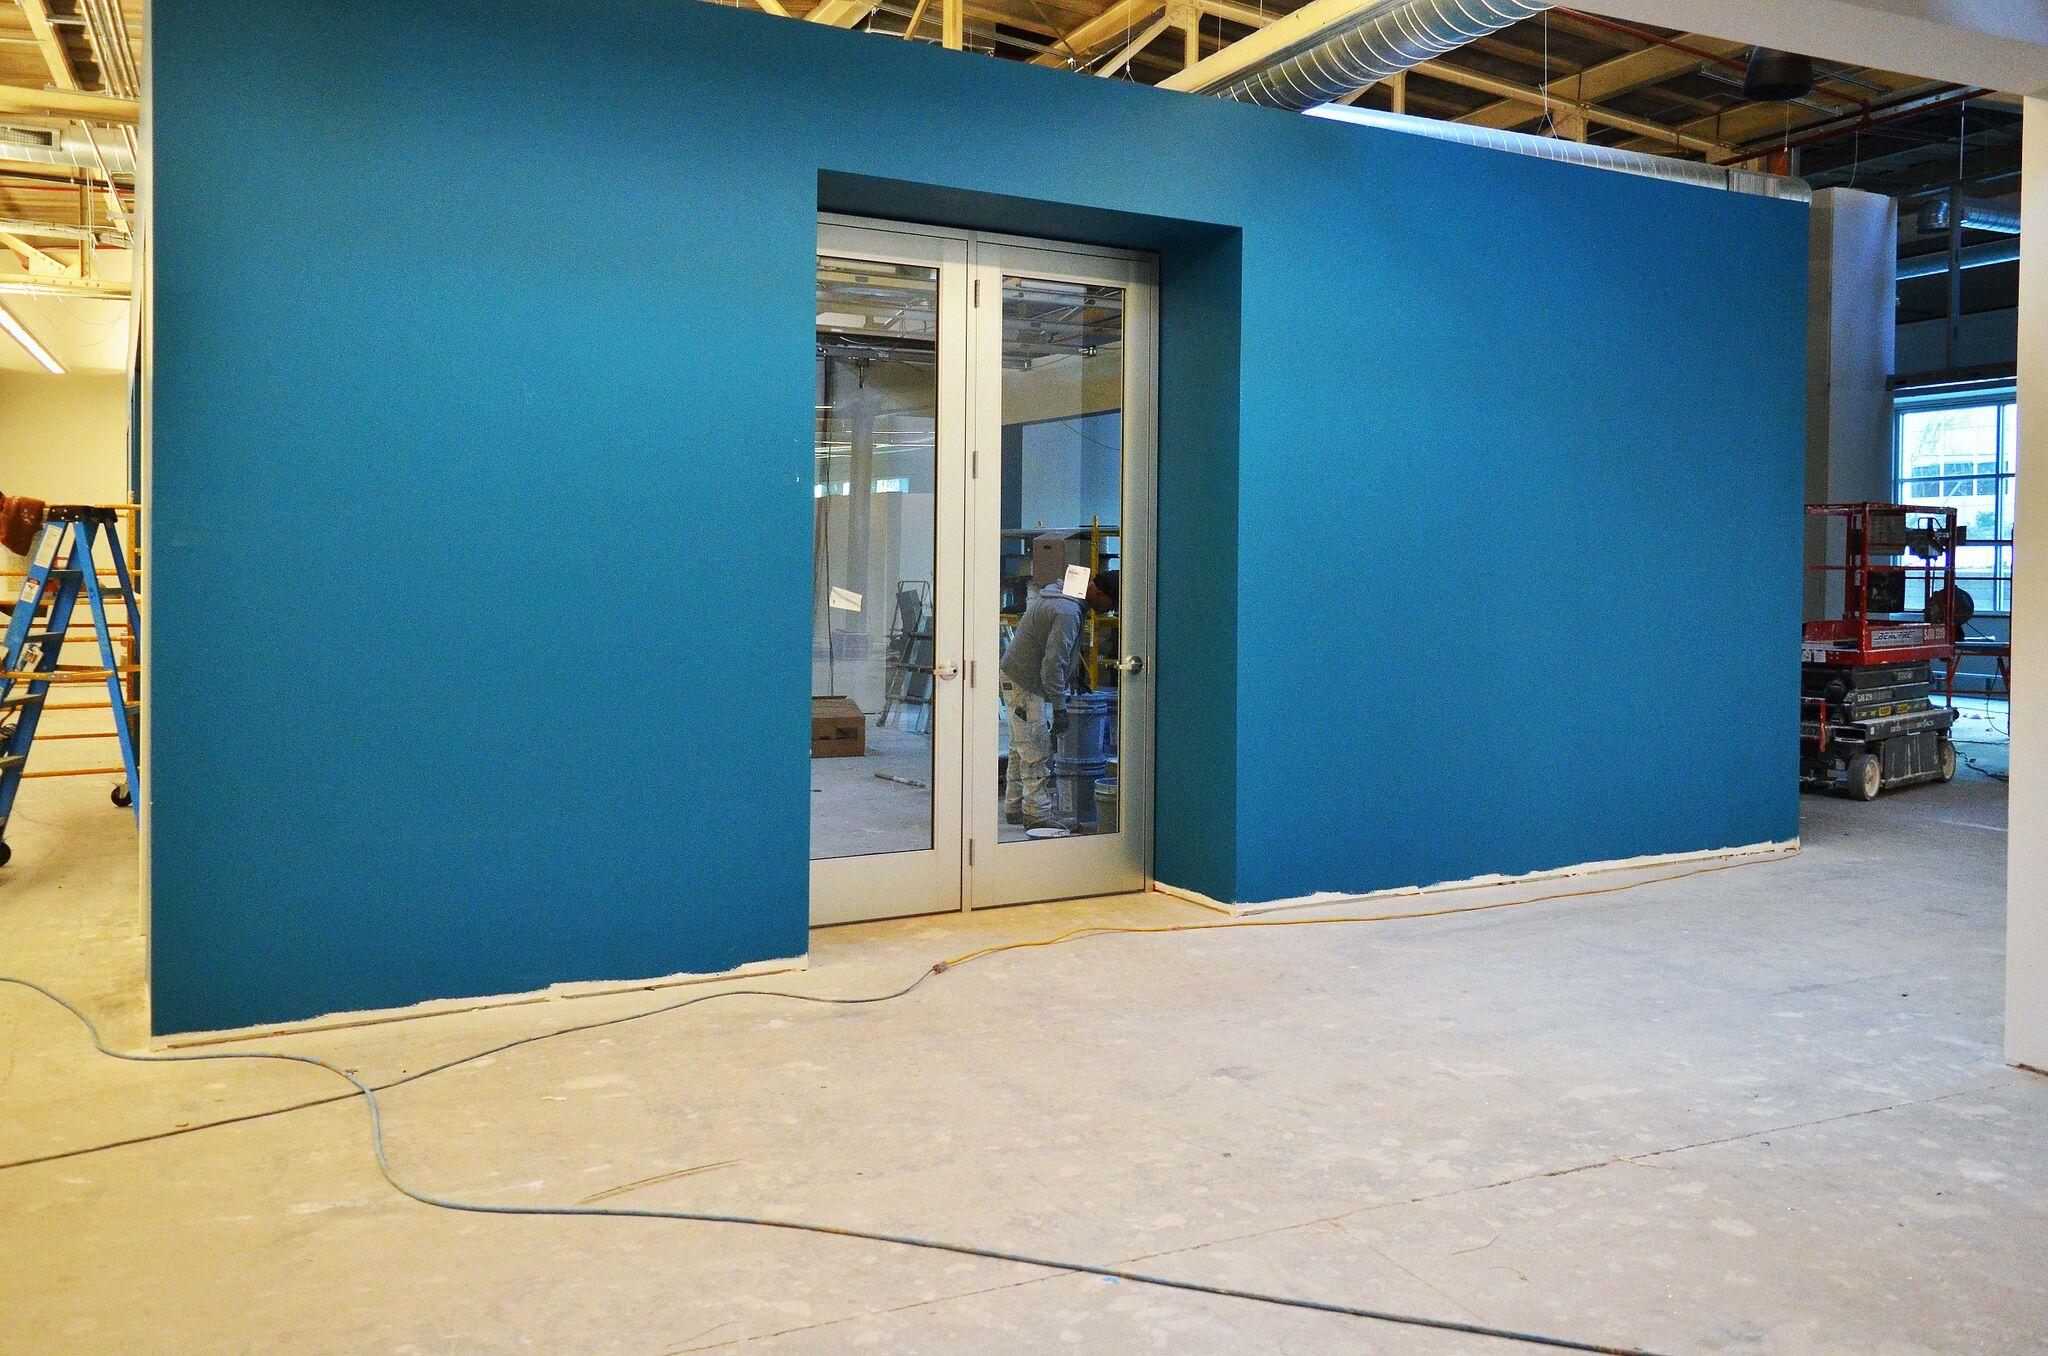 nice doors nice walls